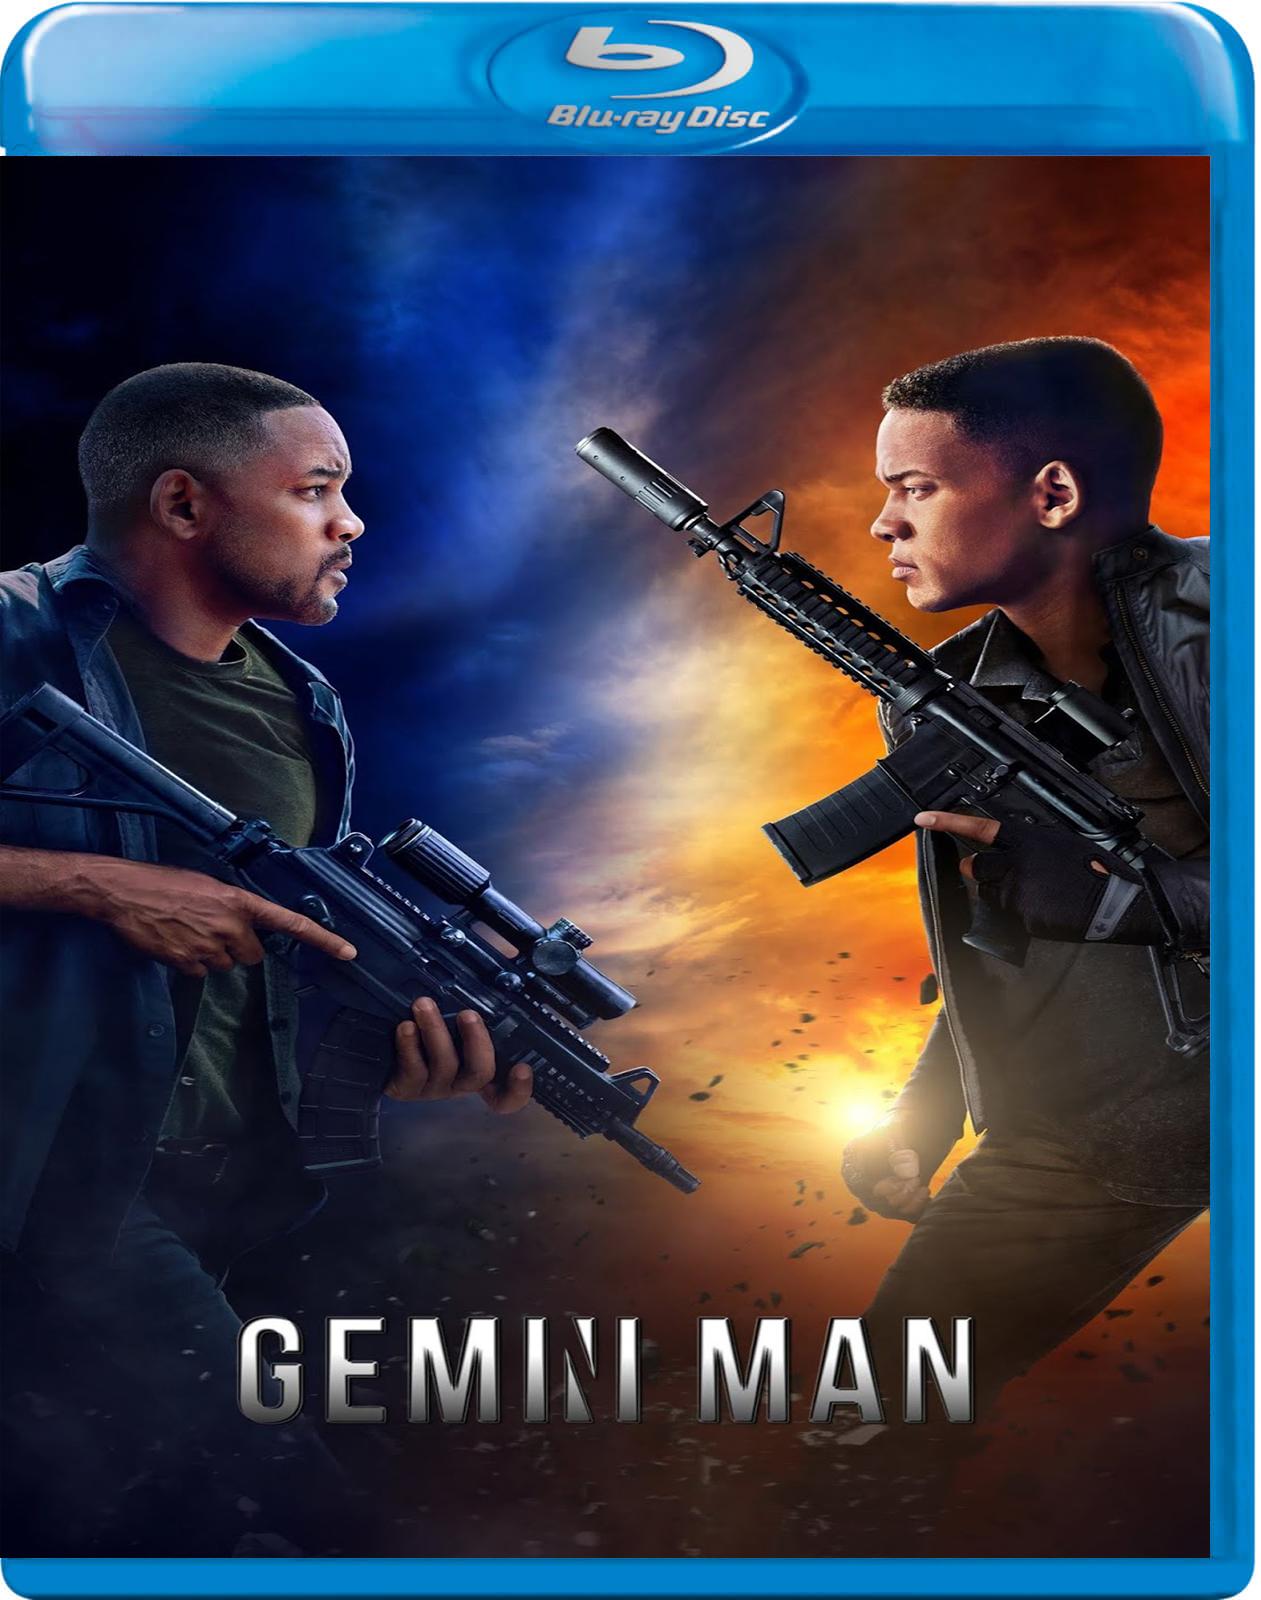 Gemini Man [2019] [BD50] [Latino]